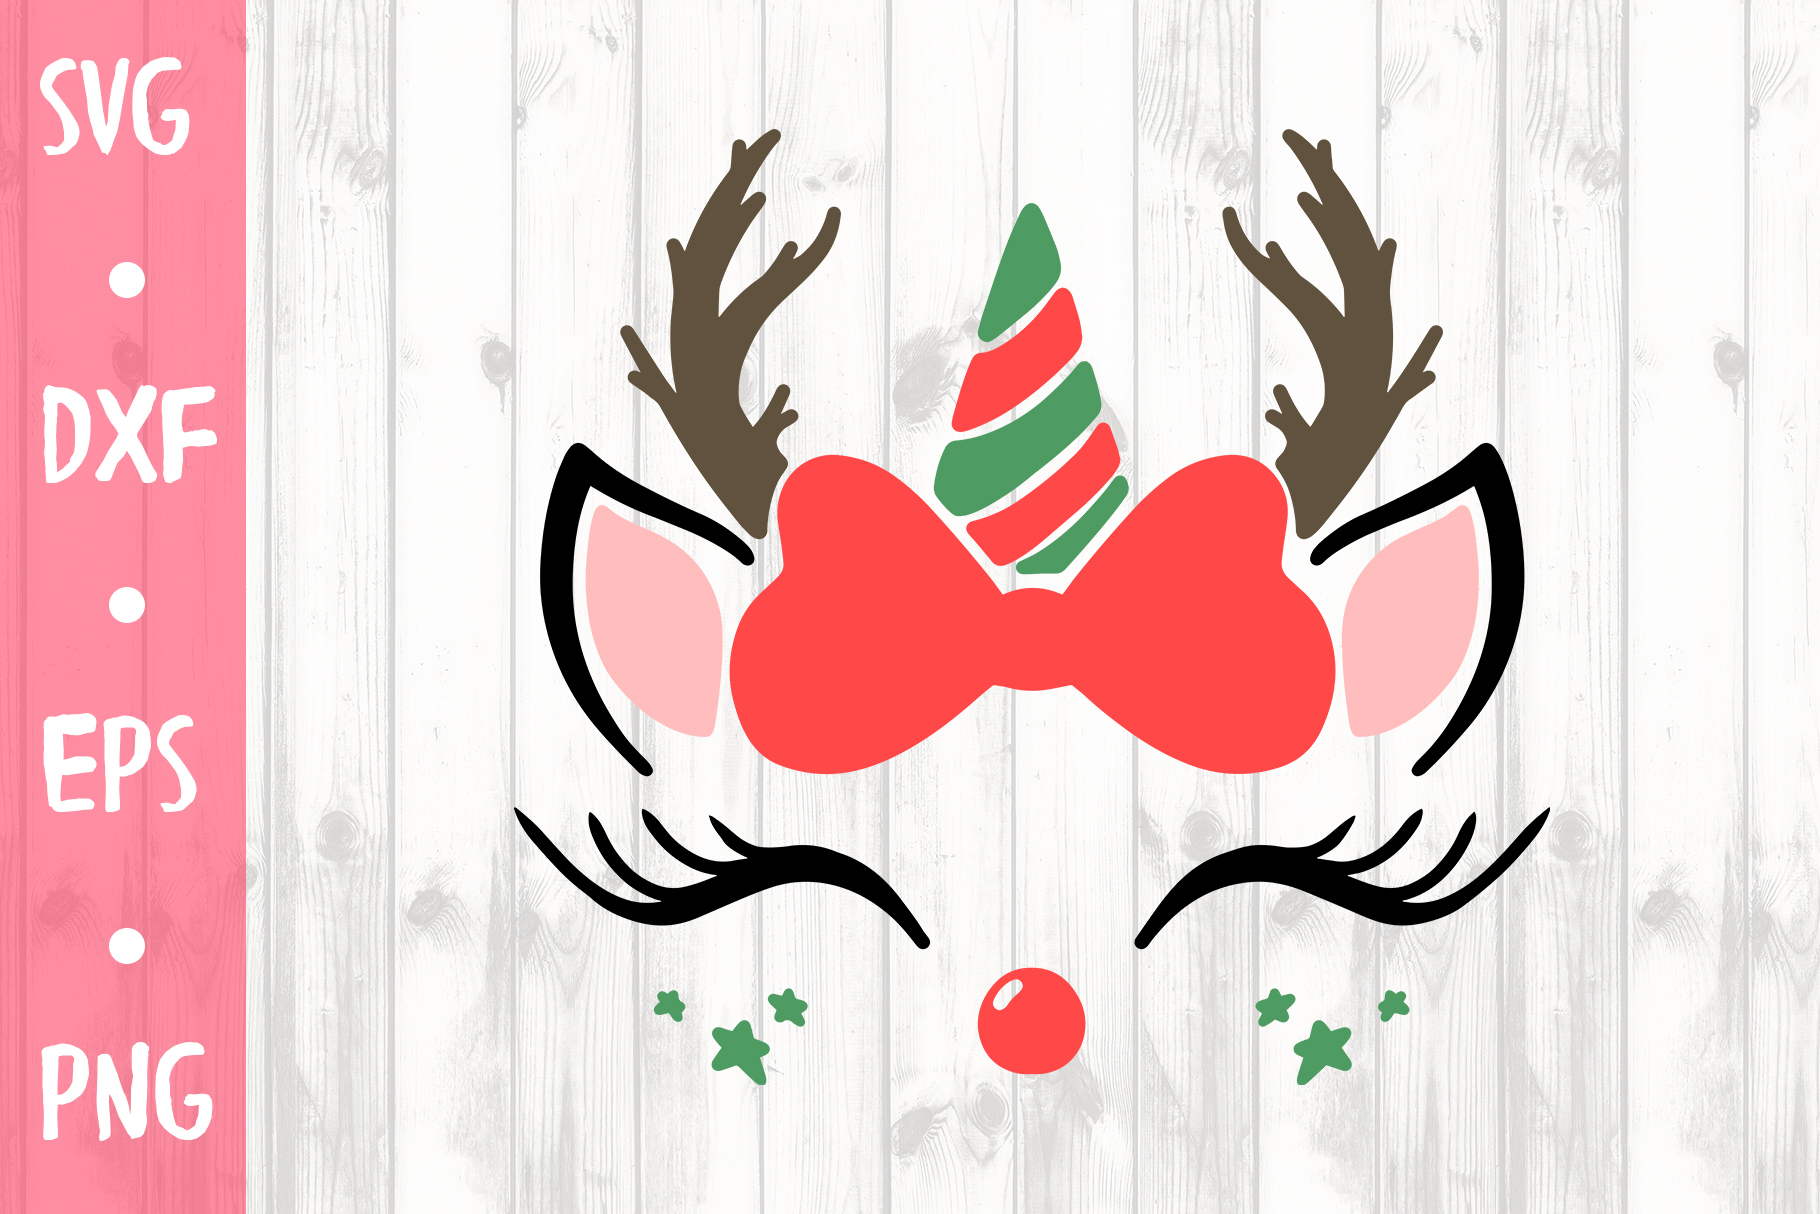 CUTE CHRISTMAS UNICORN SVG CUT FILE example image 1